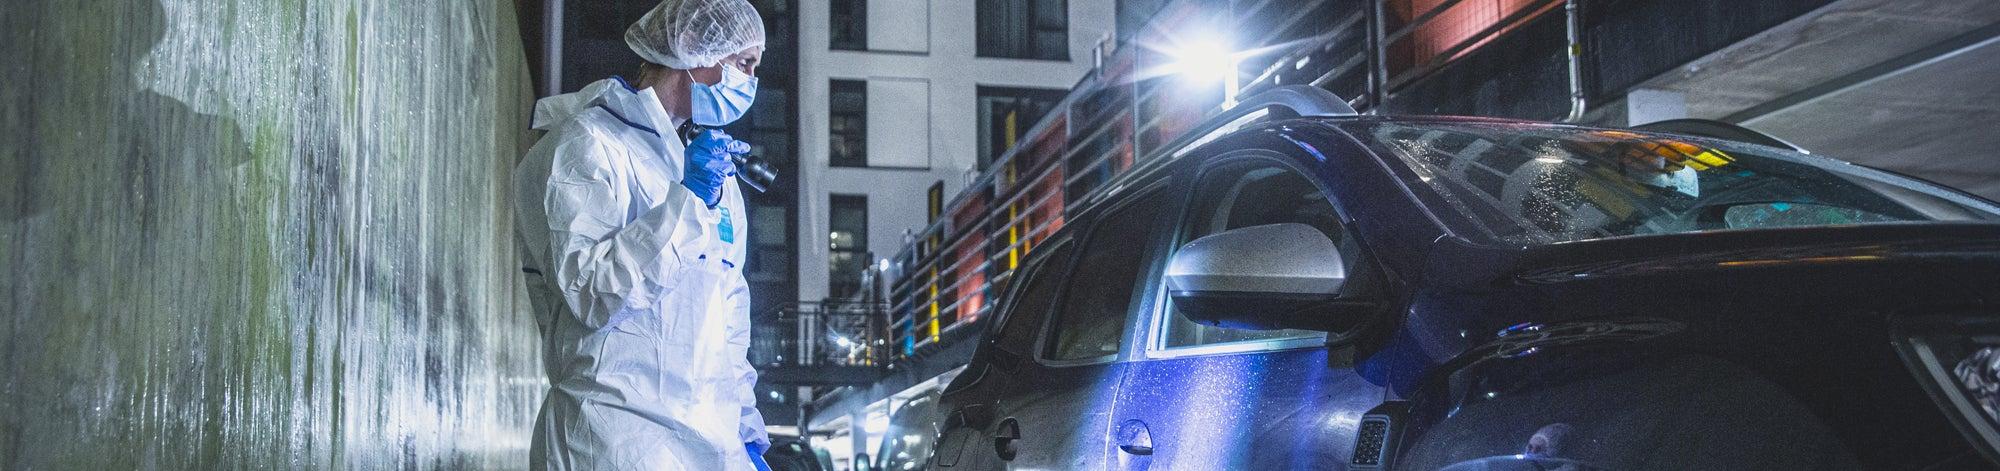 Forensics: The Real CSI, BBC - a CSIO assesses a car